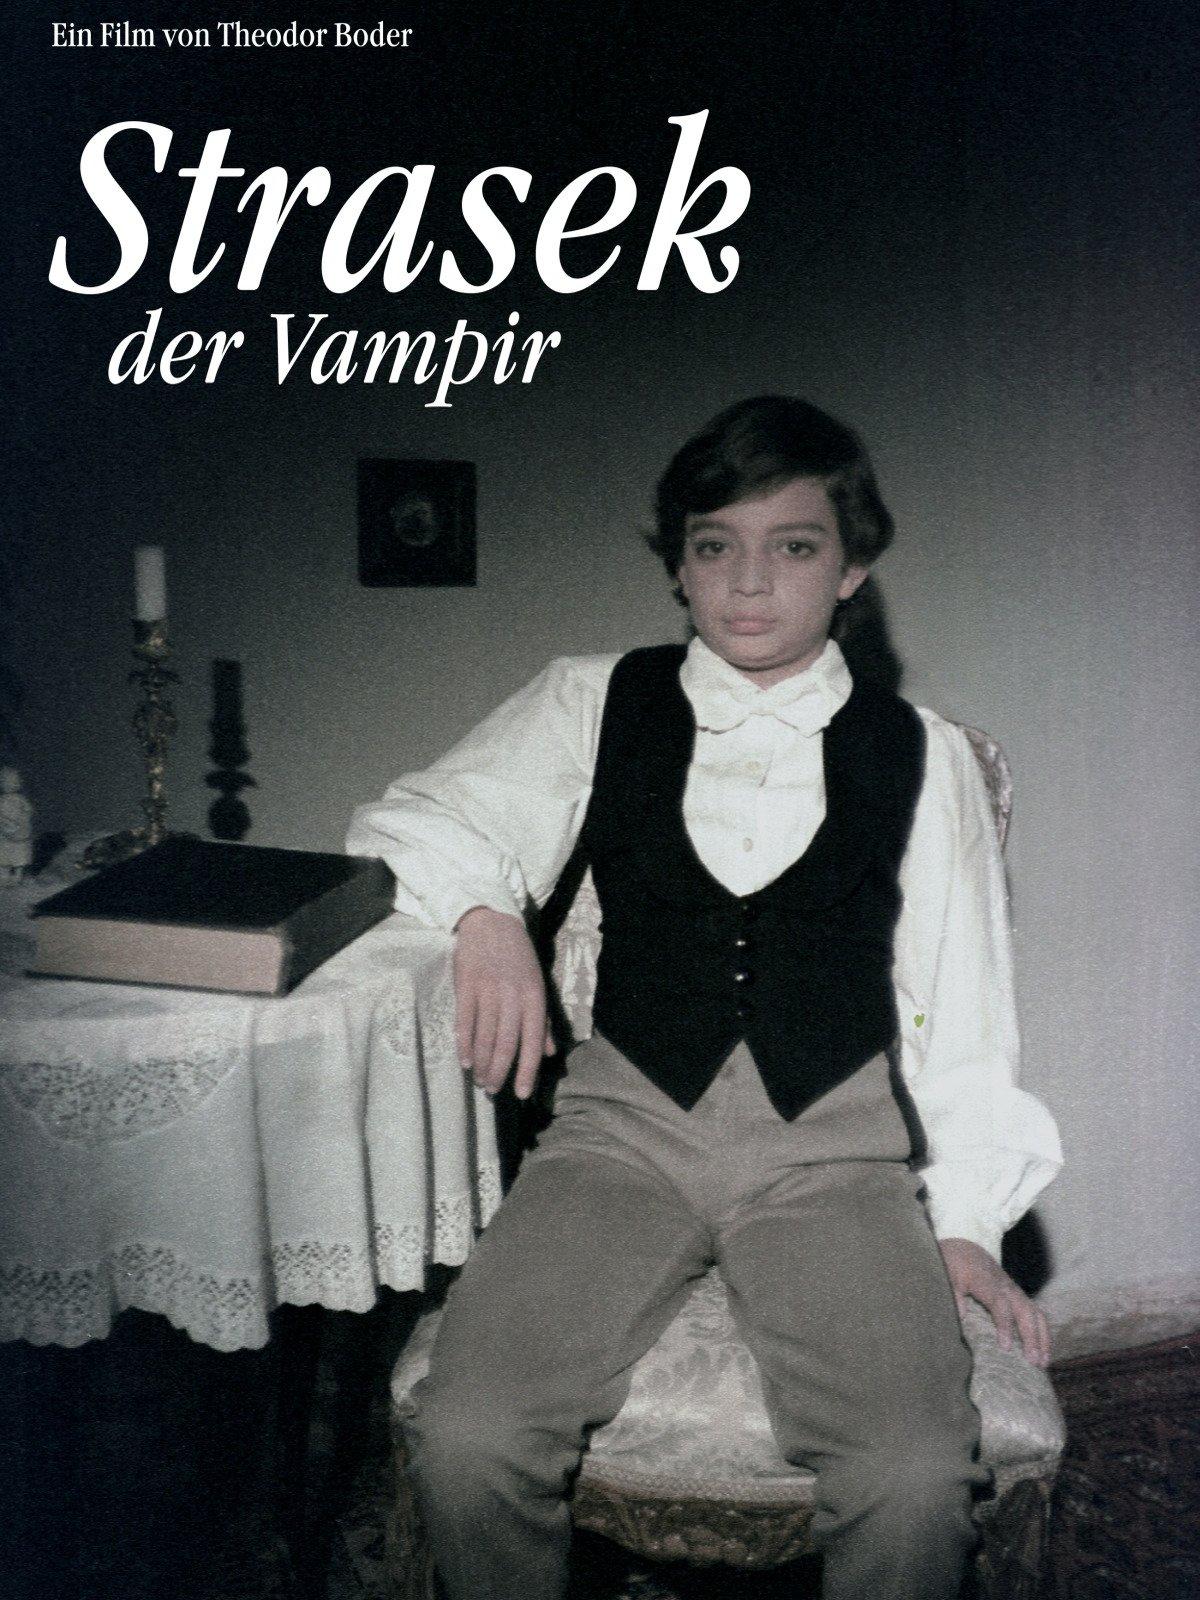 Strasek, der Vampir on Amazon Prime Video UK